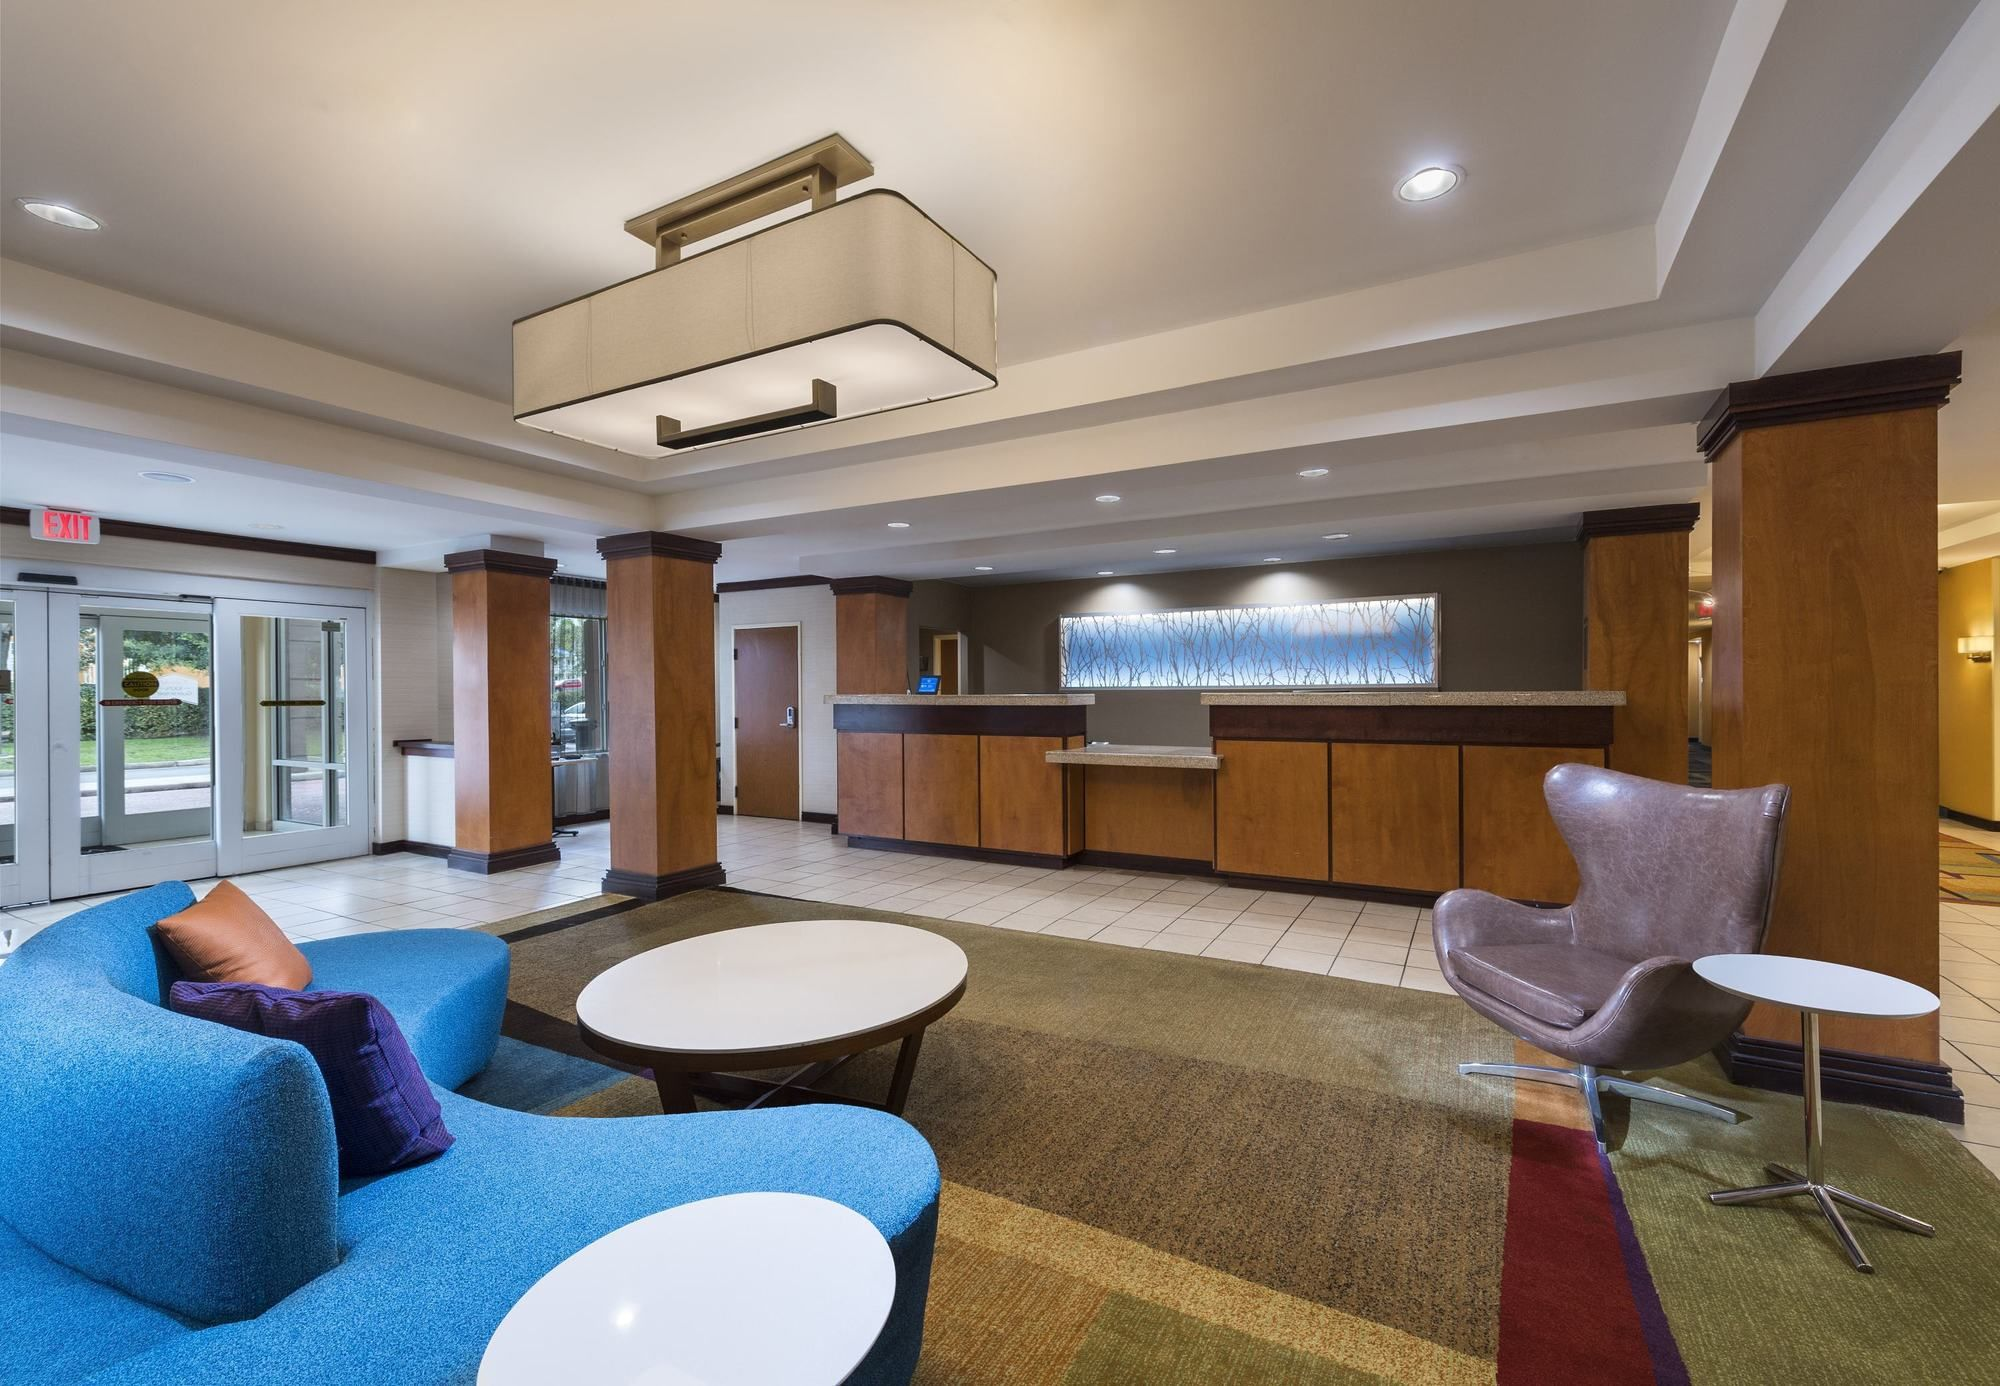 Fairfield Inn & Suites in Marianna, FL